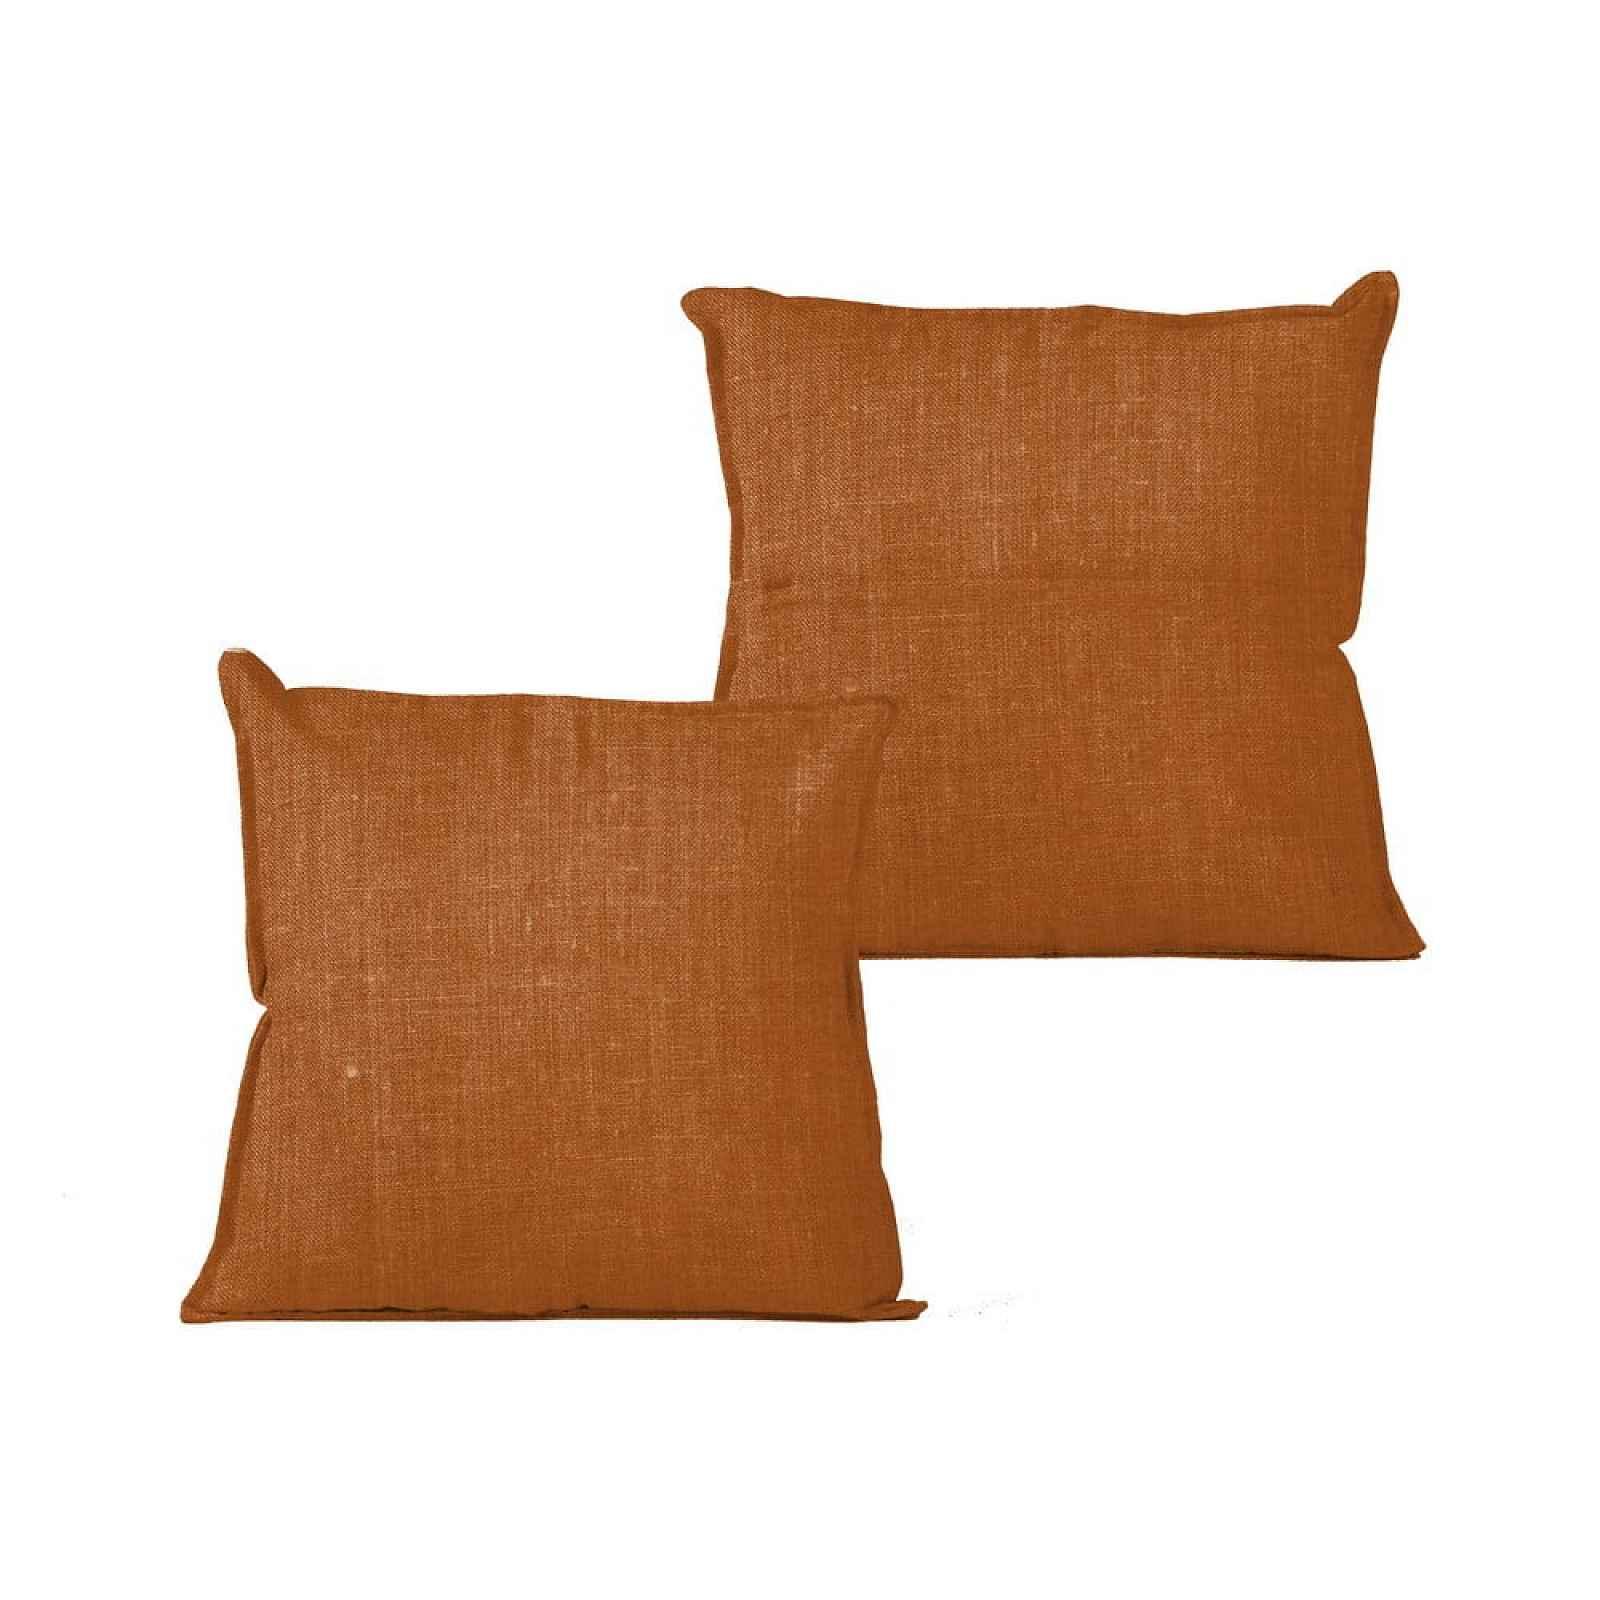 Oranžový polštář Linen Couture Terracota,45x45cm